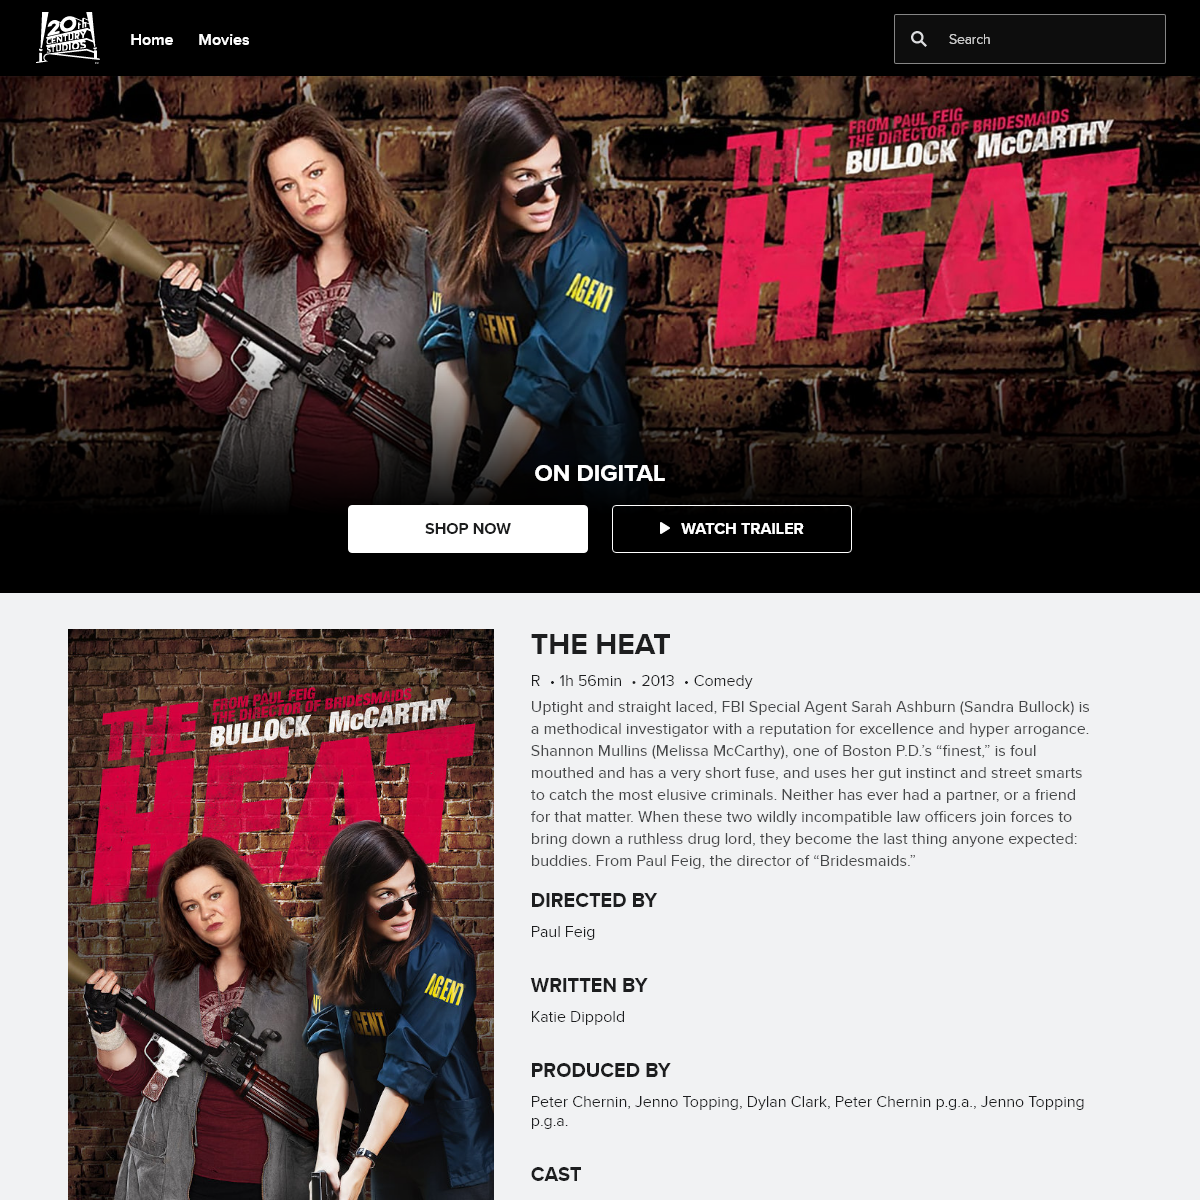 The Heat - 20th Century Studios